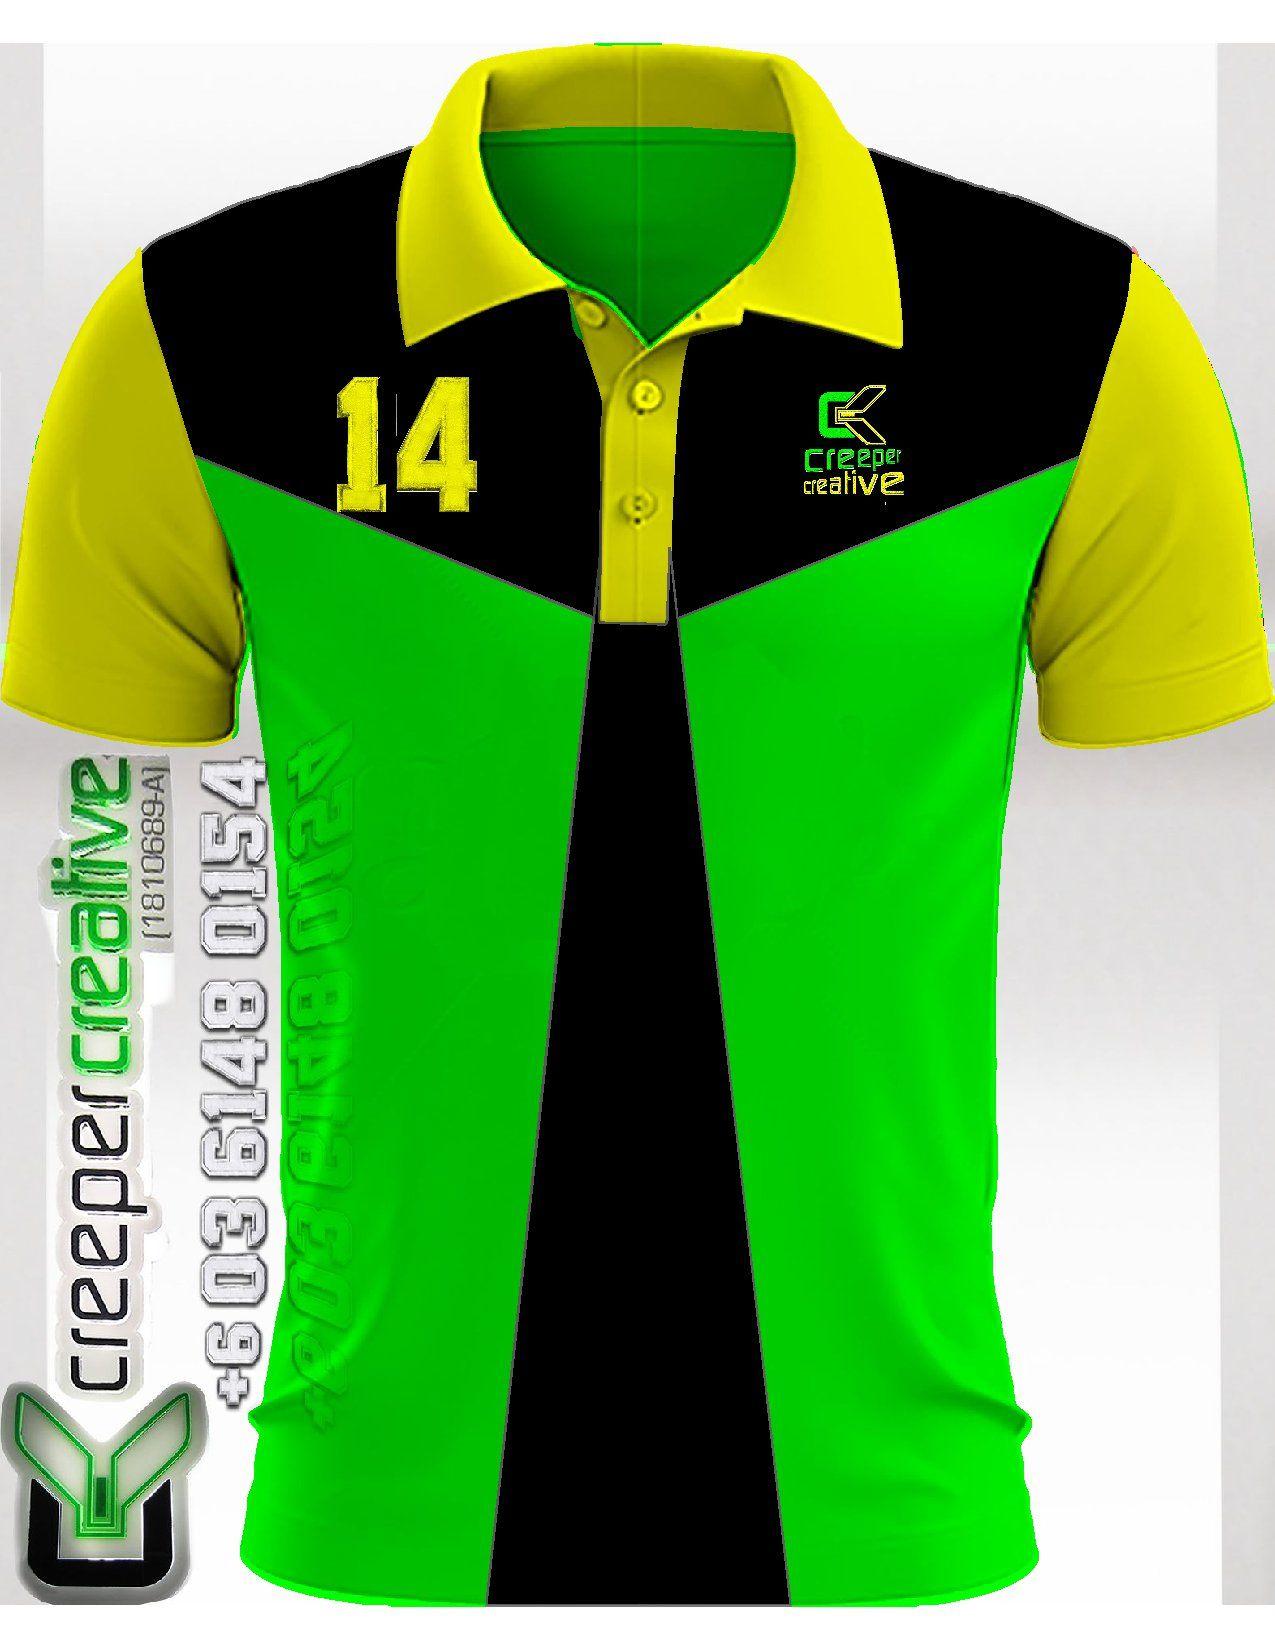 Kami mengeluarkan :  1. Corporate Uniform 2. Casual Shirt 4. Polo / Collar Lacoste 6. Exec Jacket  Call 03 6148 0154